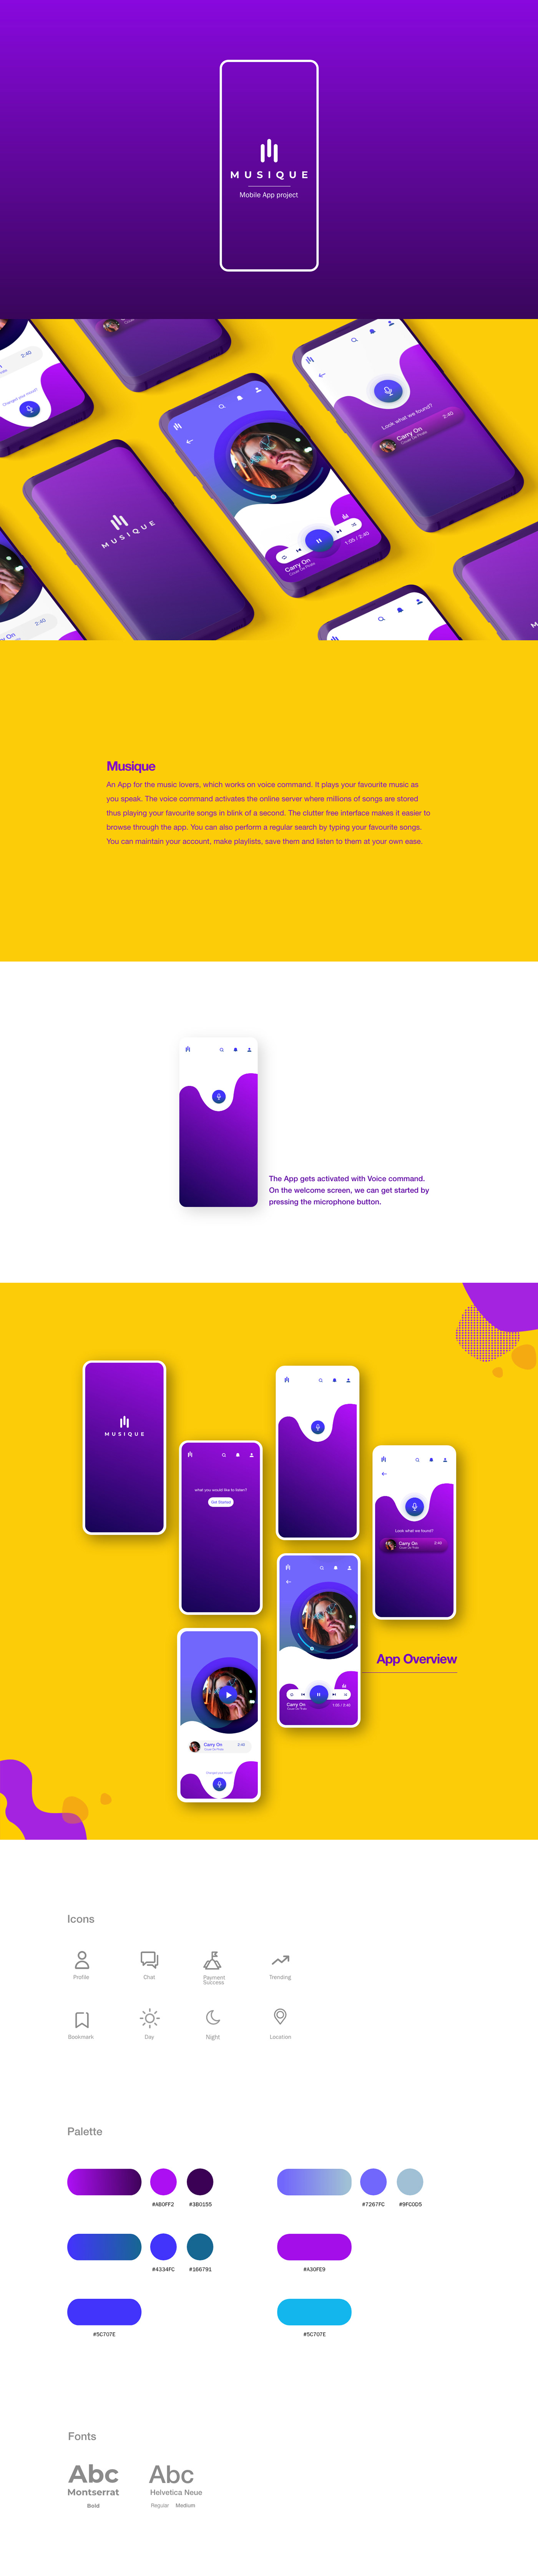 UI/UX Interaction design  design Appdesign app Interface user interface user experience interaction Voice Activation